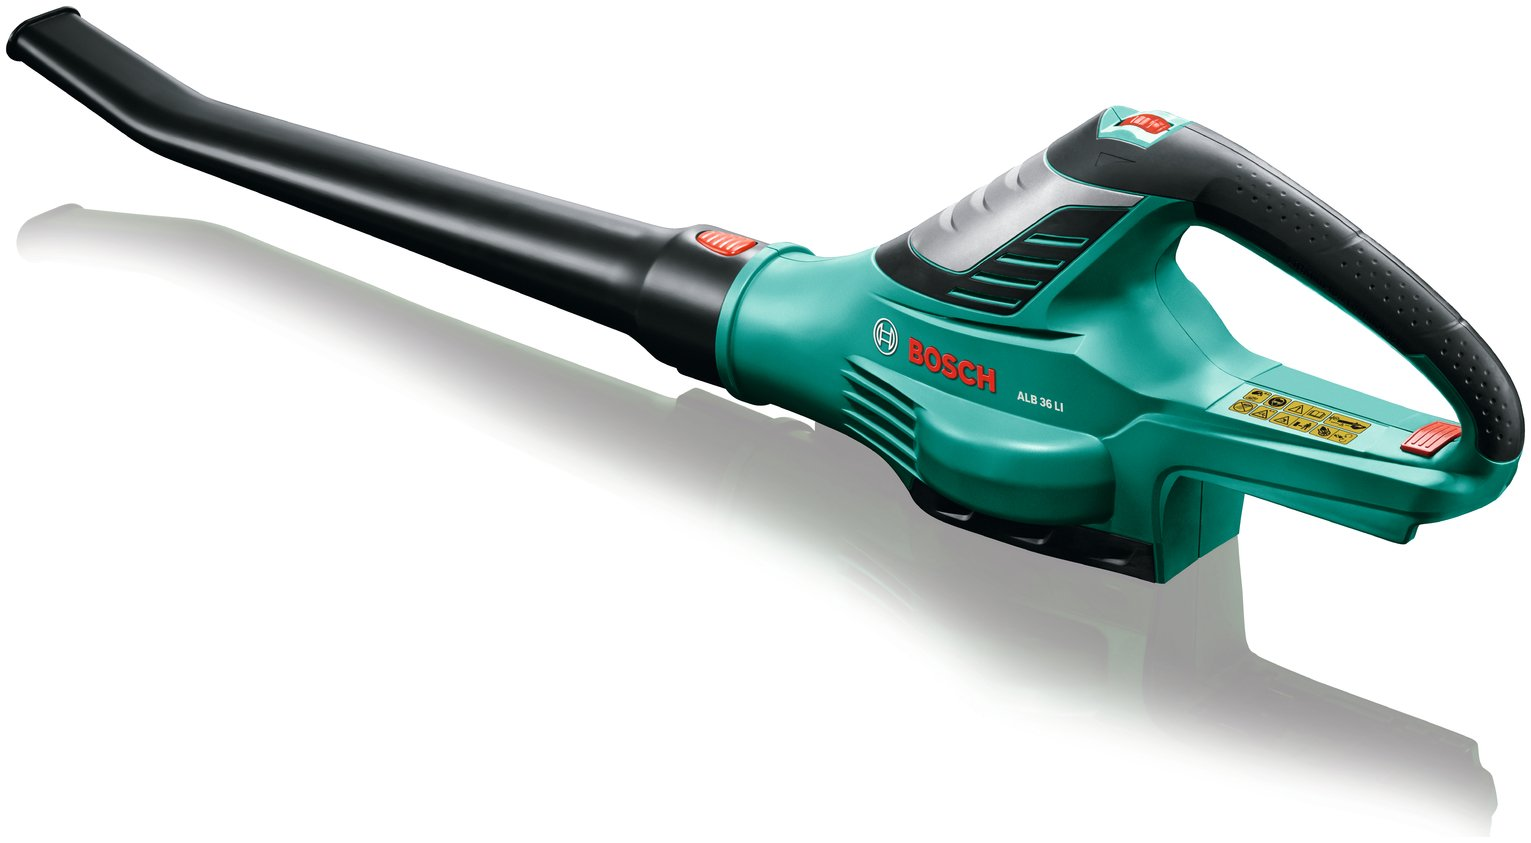 Image of Bosch ALB36 LI Cordless Leafblower 36V 2.0AH